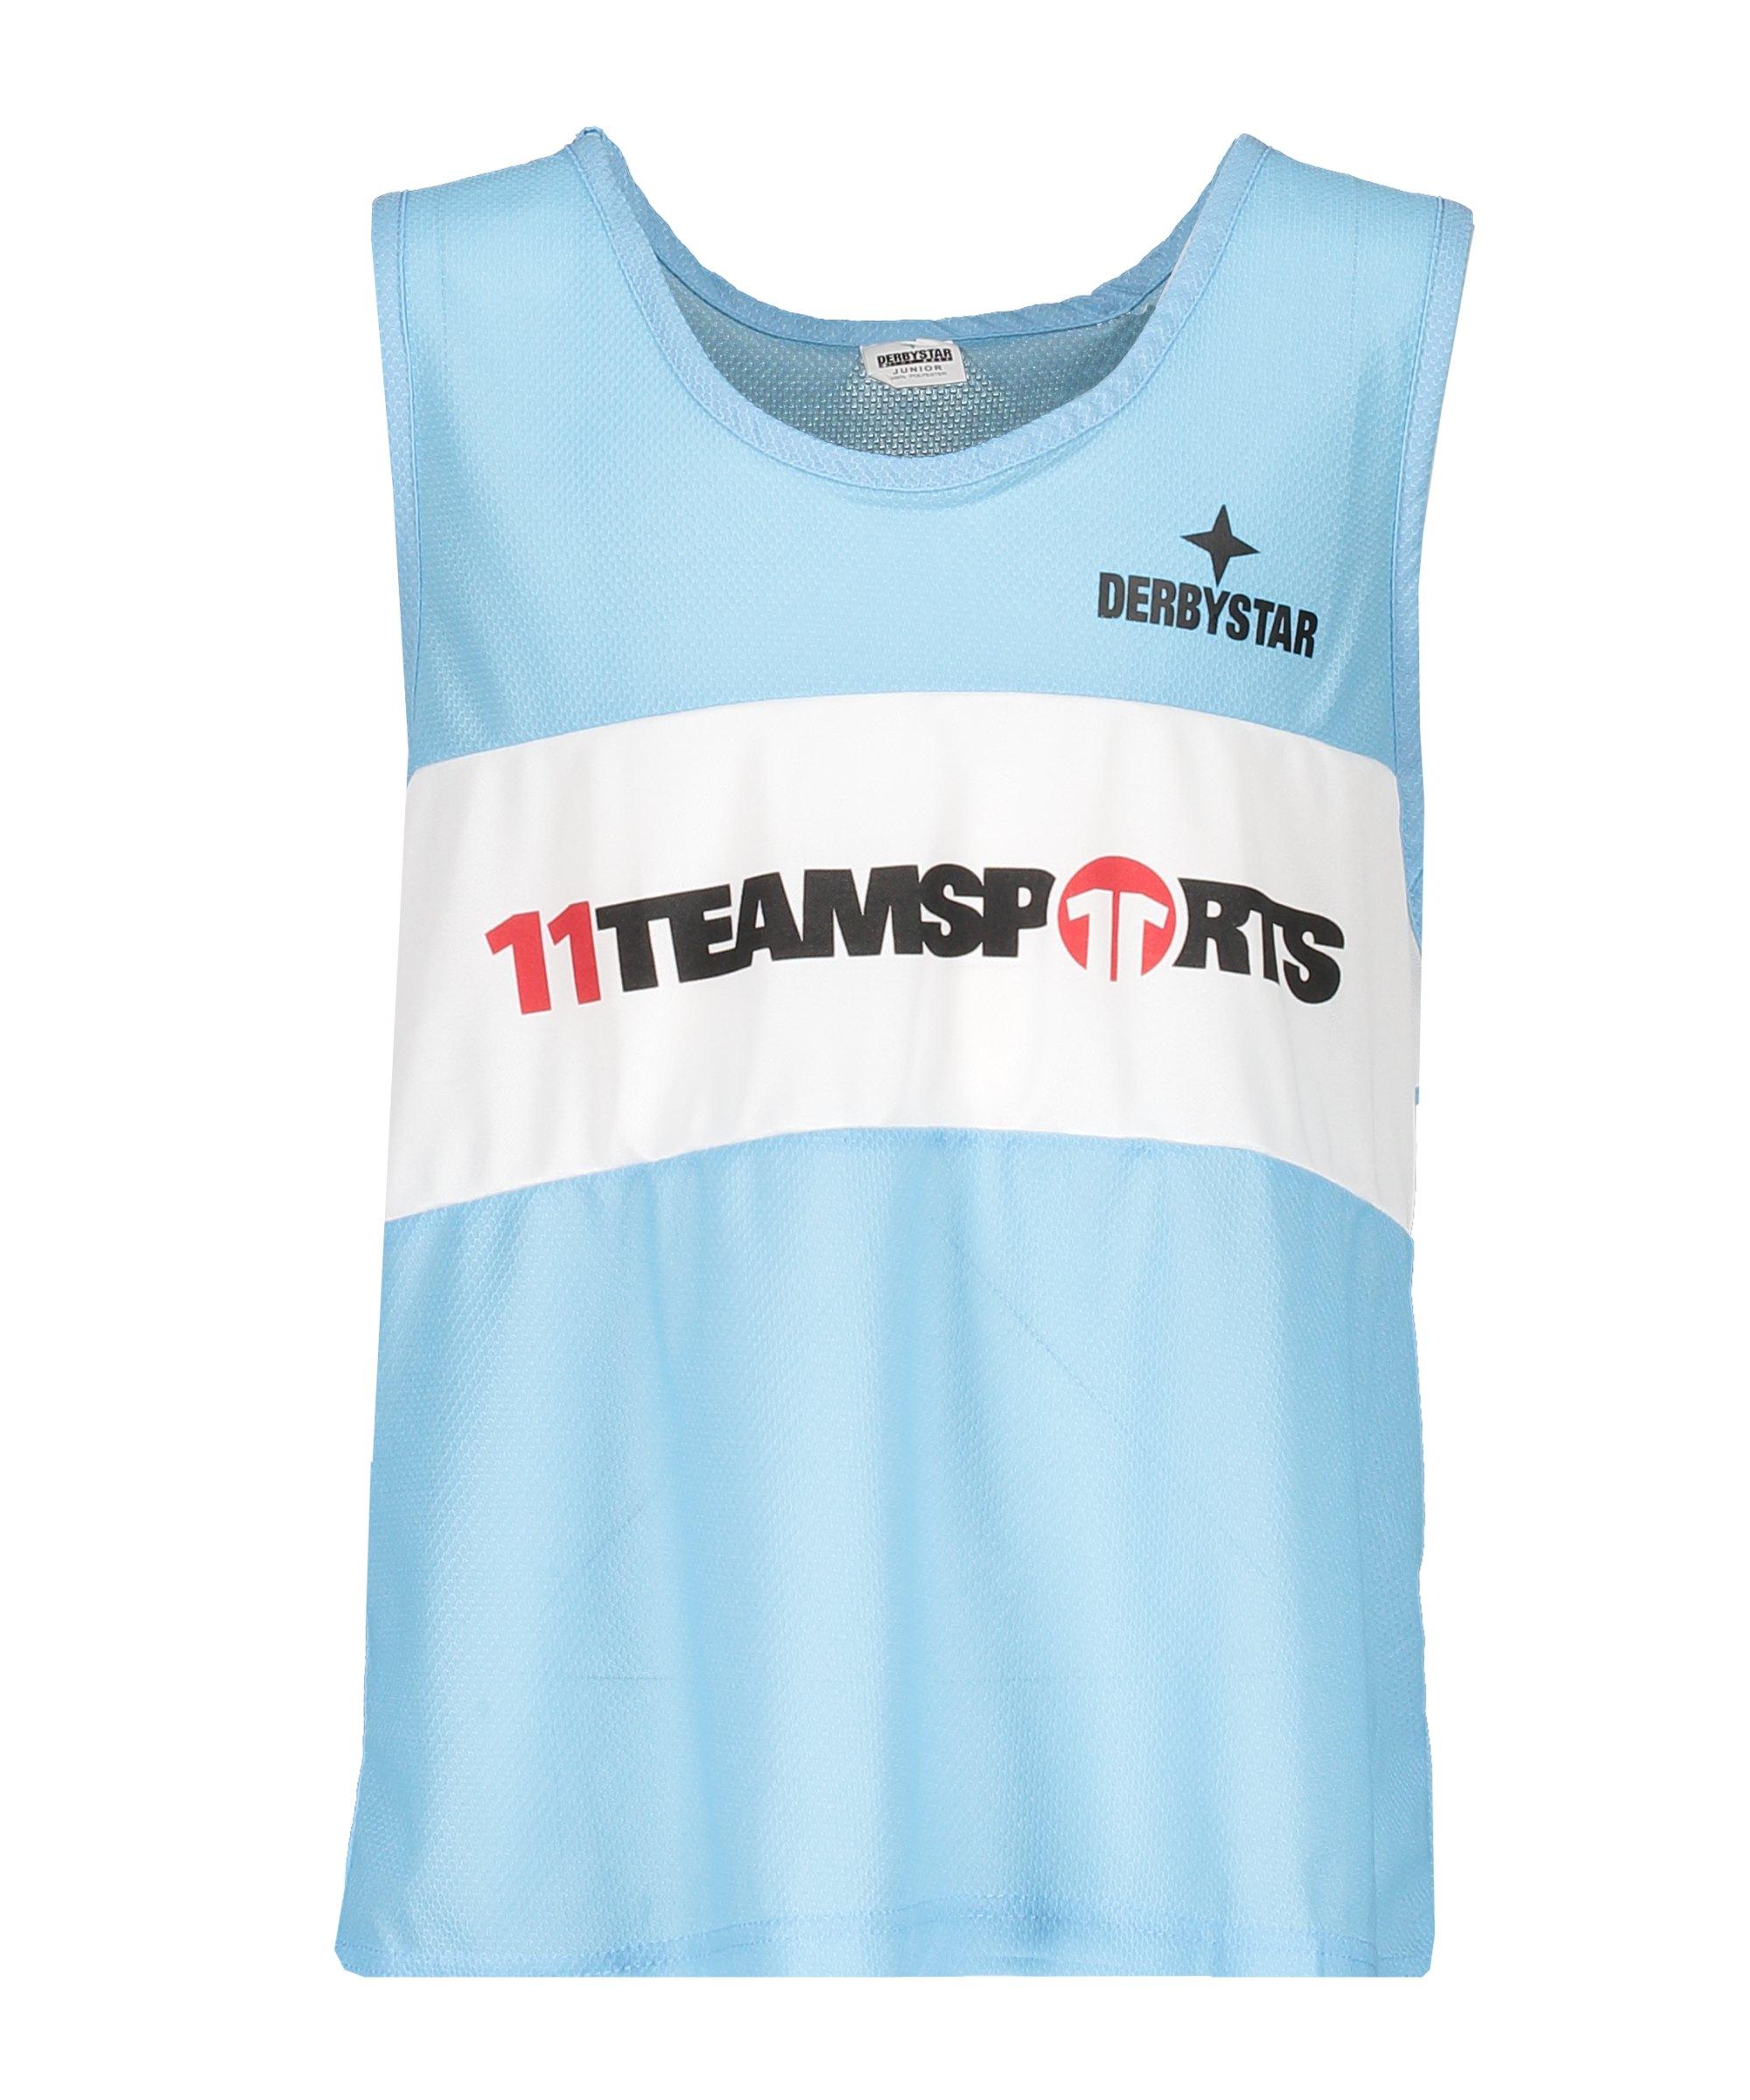 Derbystar Markierungshemdchen 11 teamsports Blau - blau